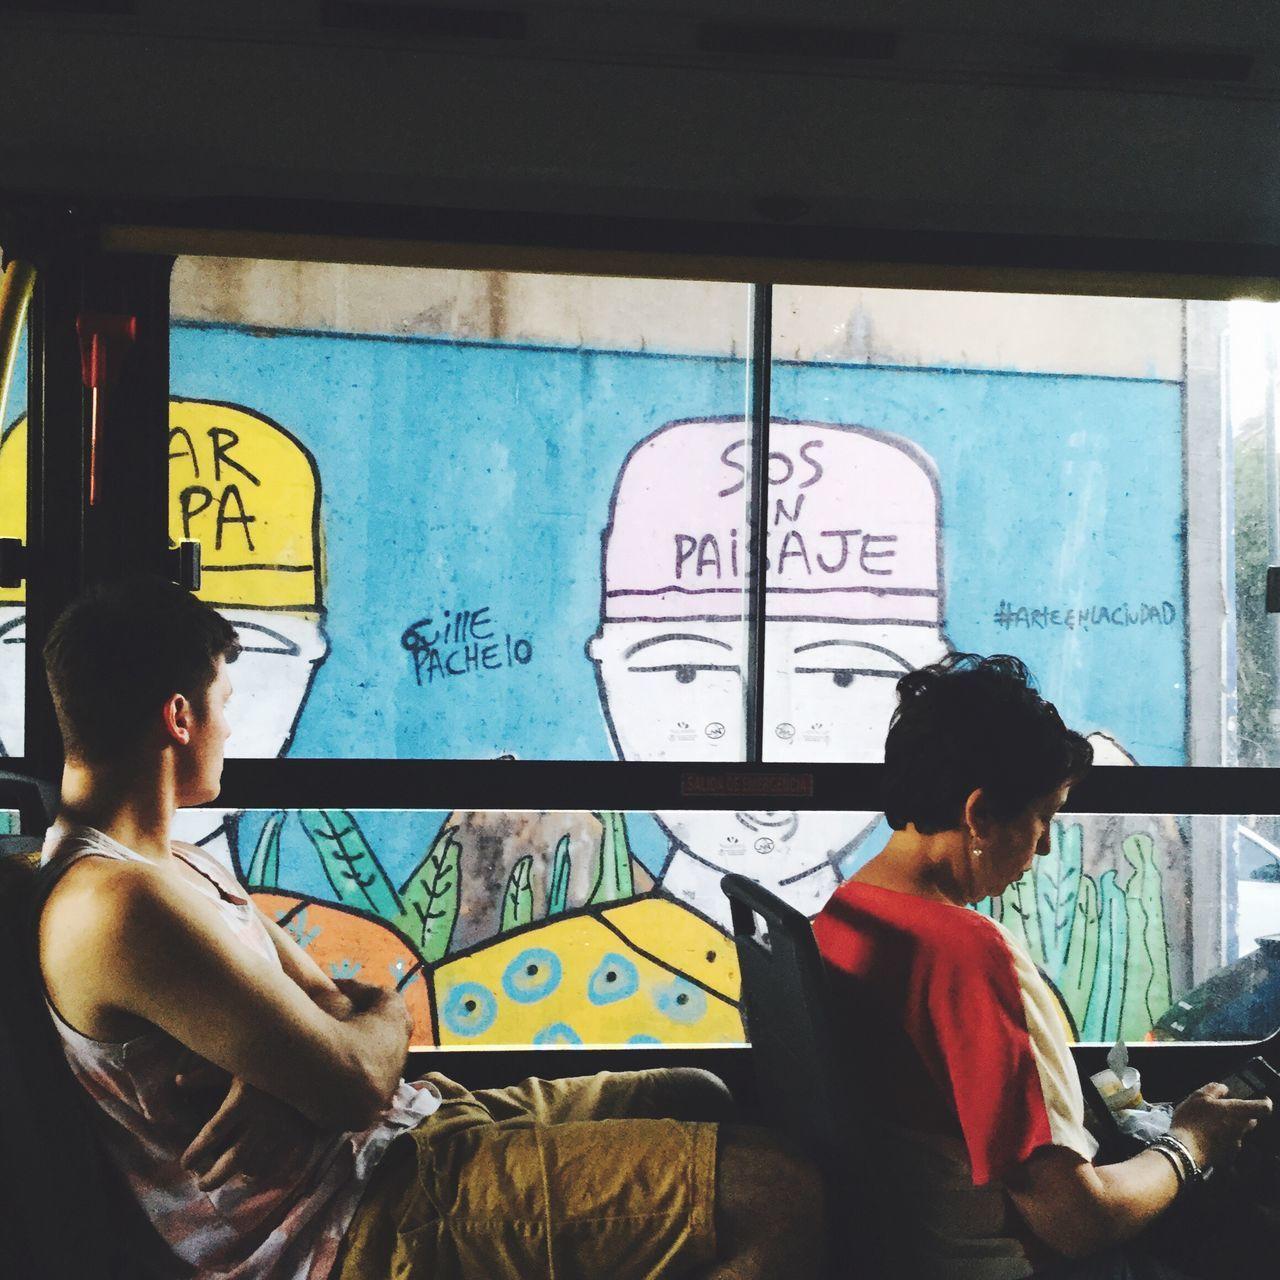 Window Transportation Bus Looking Through Window Graffiti Art, Drawing, Creativity Getting Inspired Public Transportation Mode Of Transport Human RepresentationnDayyLeisure ActivityyYoung WomennIndoors sYoung Adultt